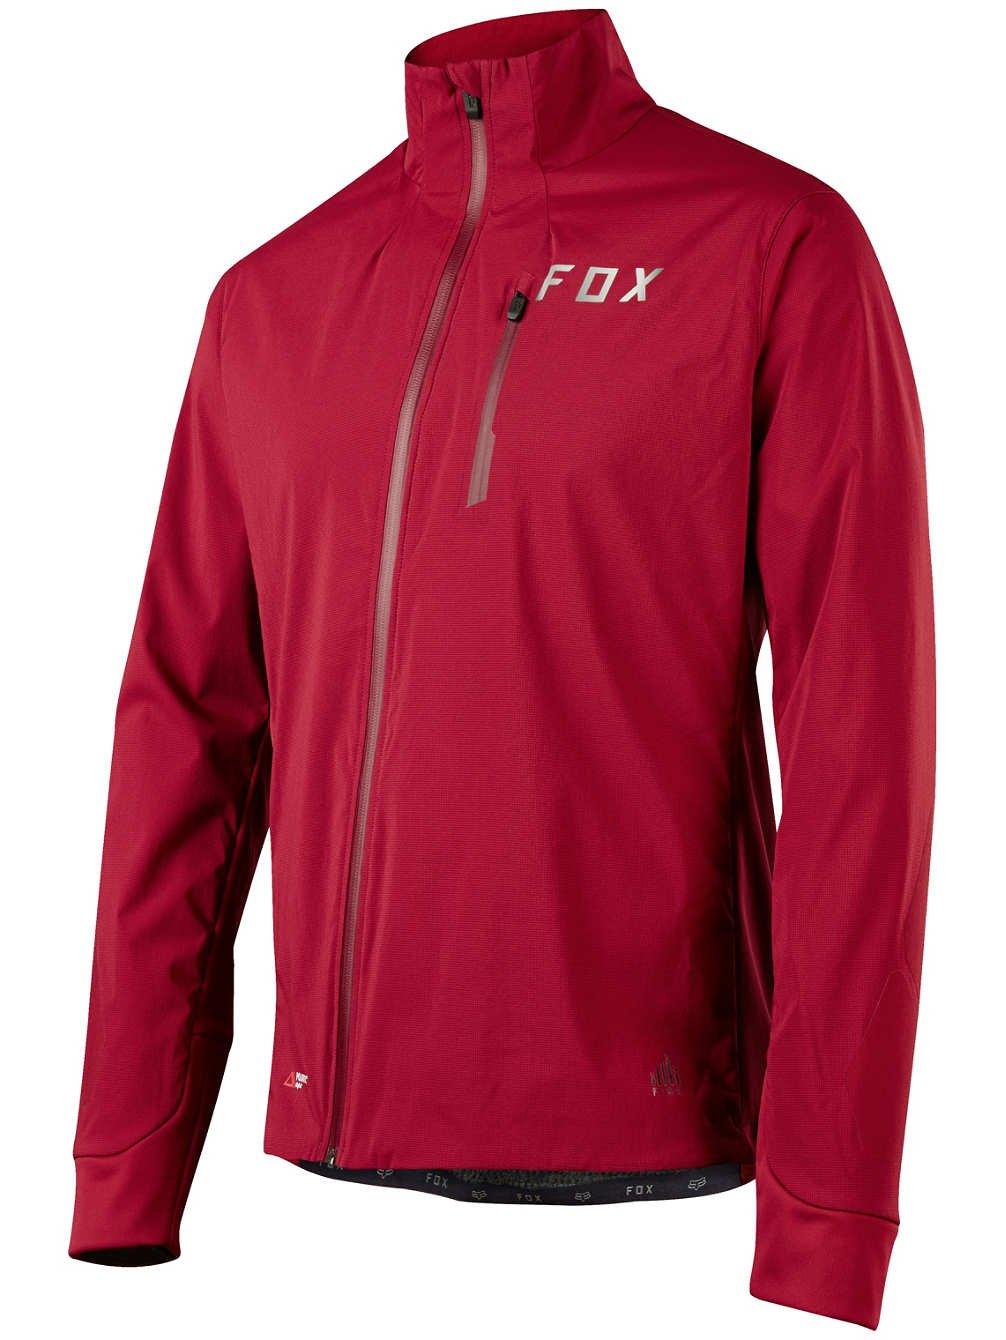 Fox Racing Attack Pro Fire半袖ジャケット – 19083 B075Y9HXSL XL|ダークレッド ダークレッド XL